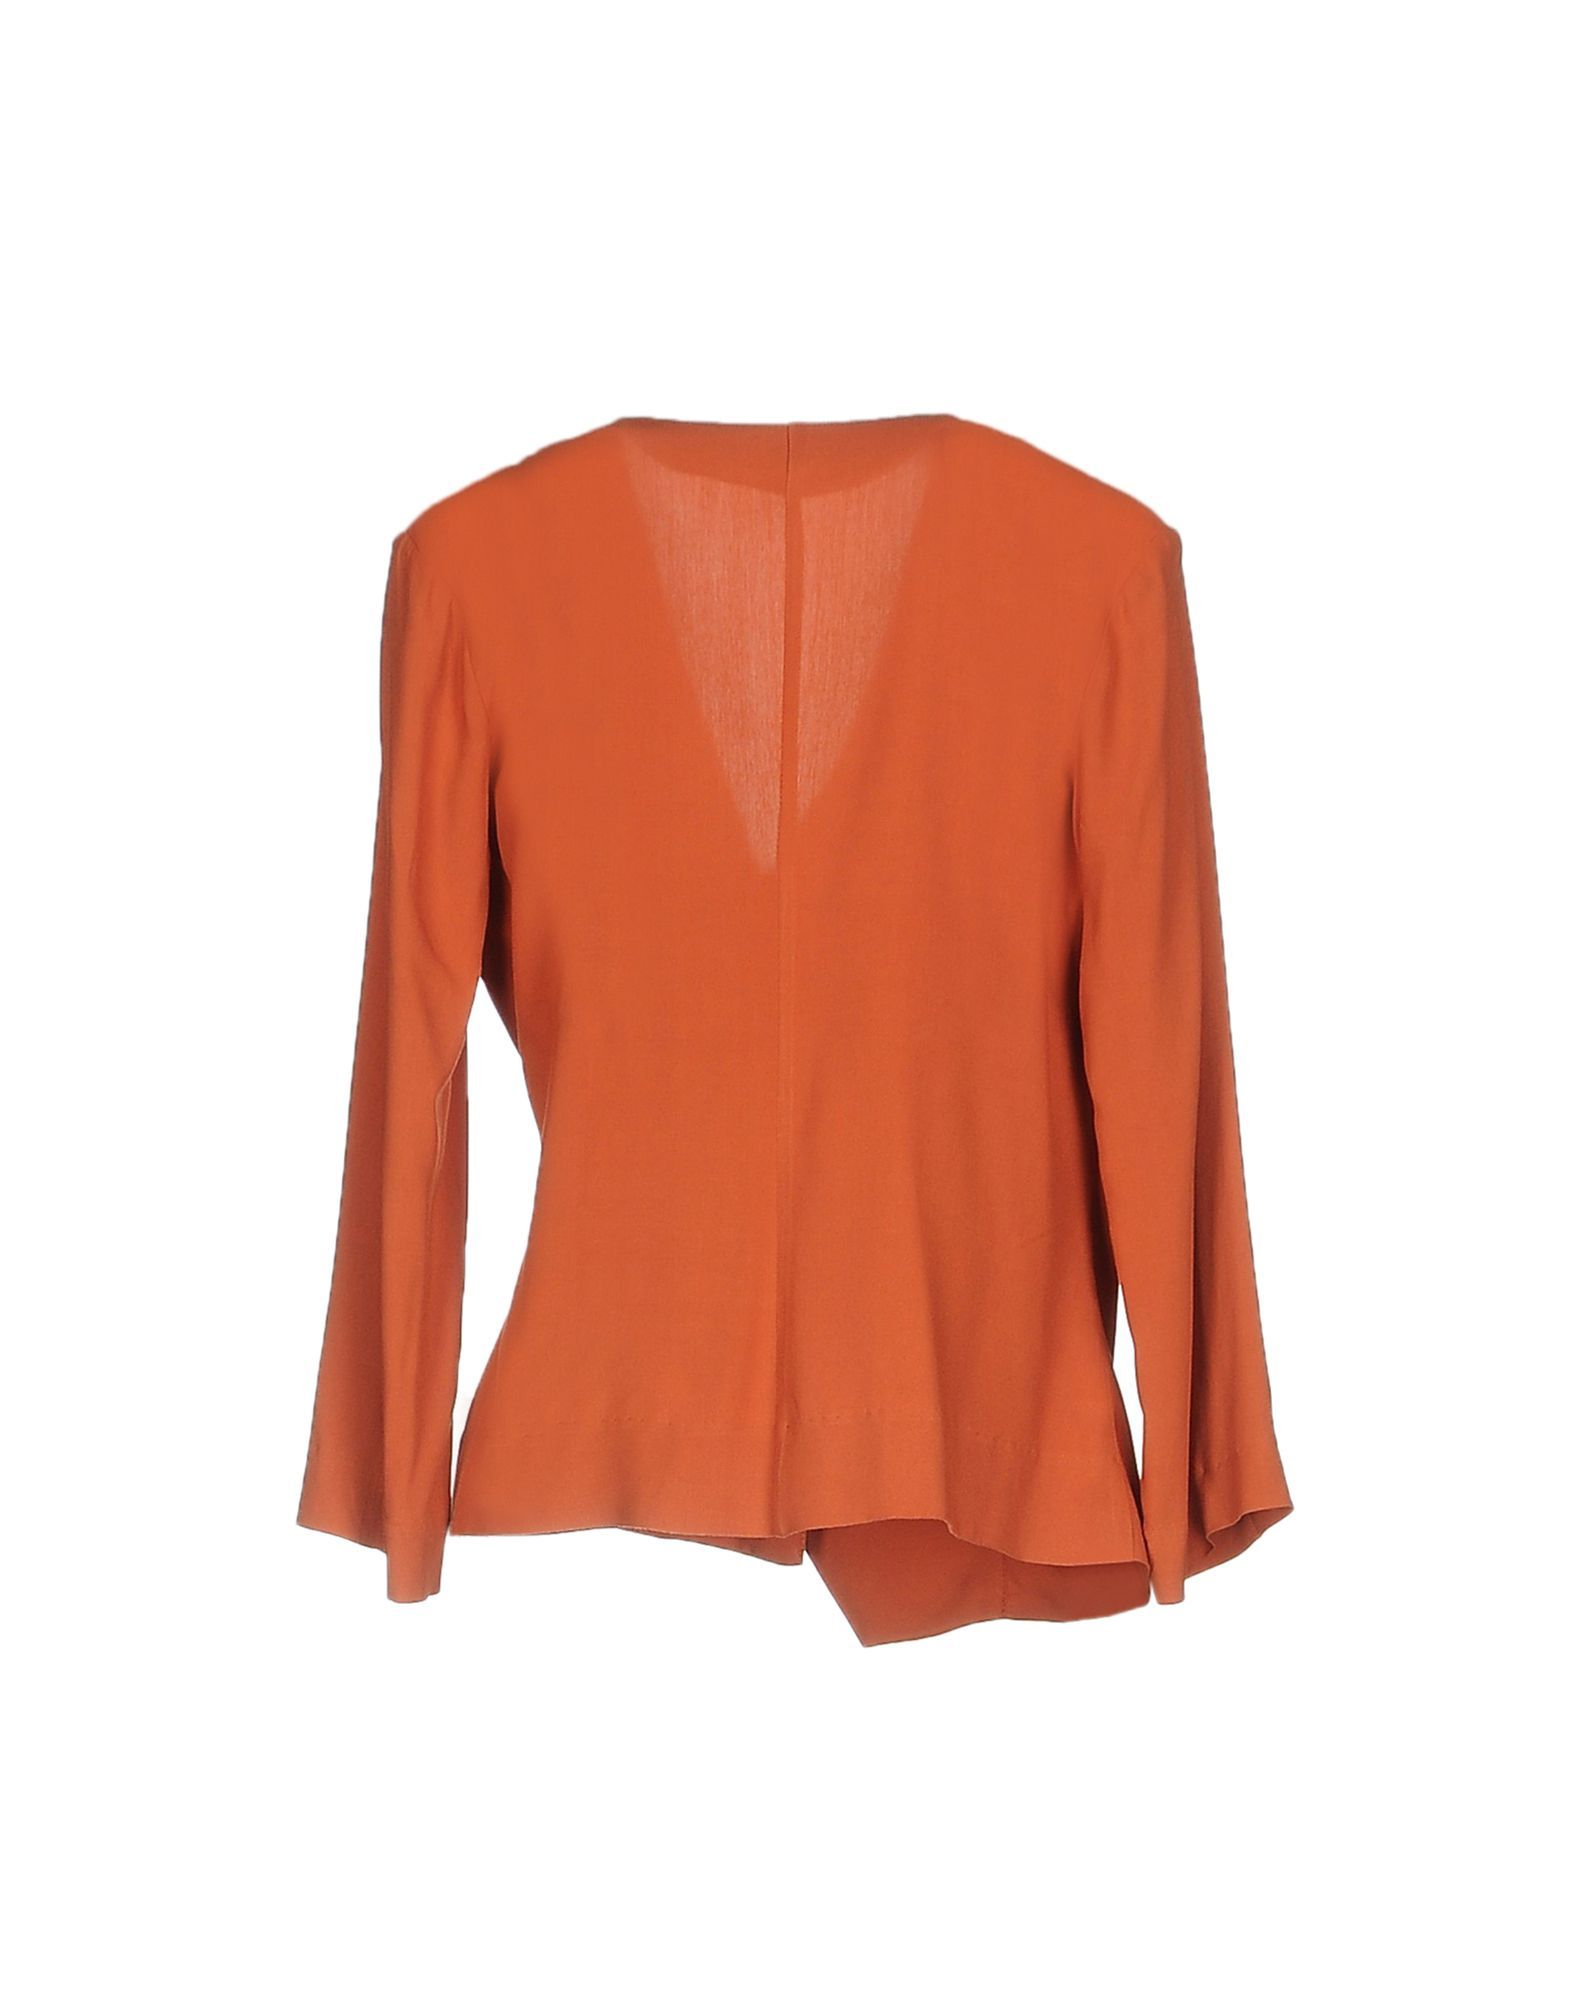 Shirts Maison Laviniaturra Orange Women's Viscose